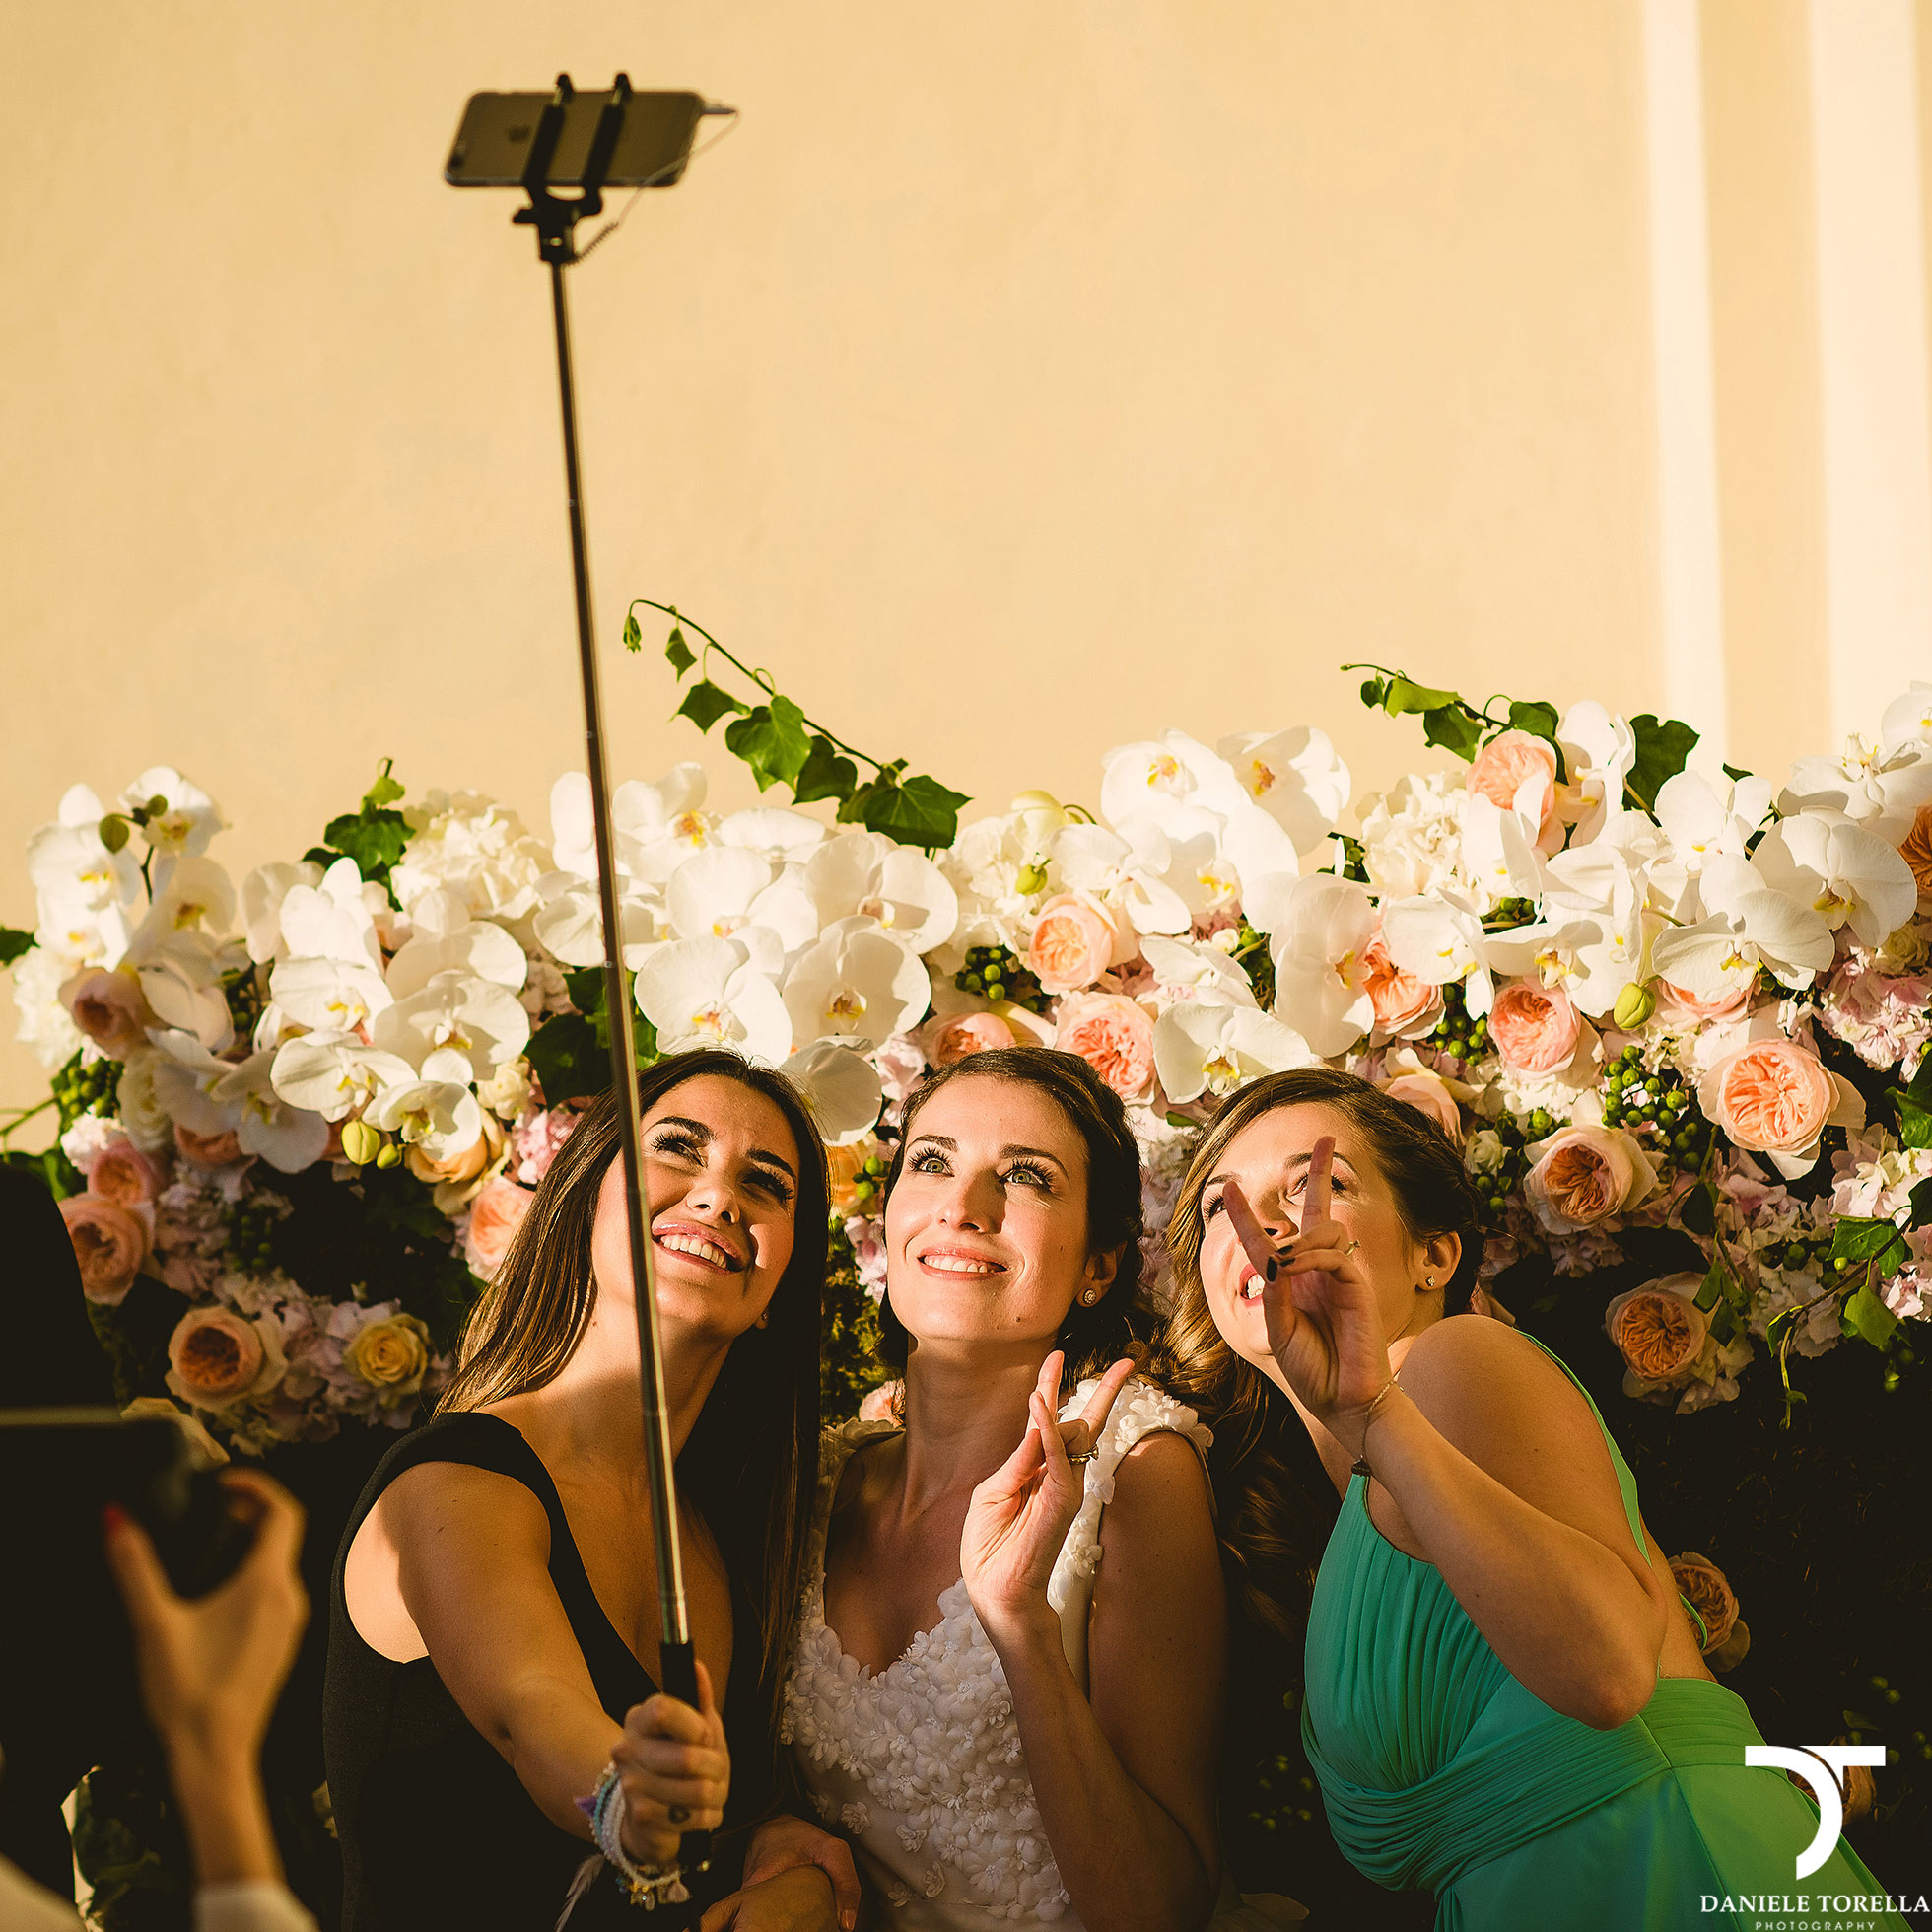 Matrimonio Esclusivo Toscana : Matrimonio esclusivo a roma